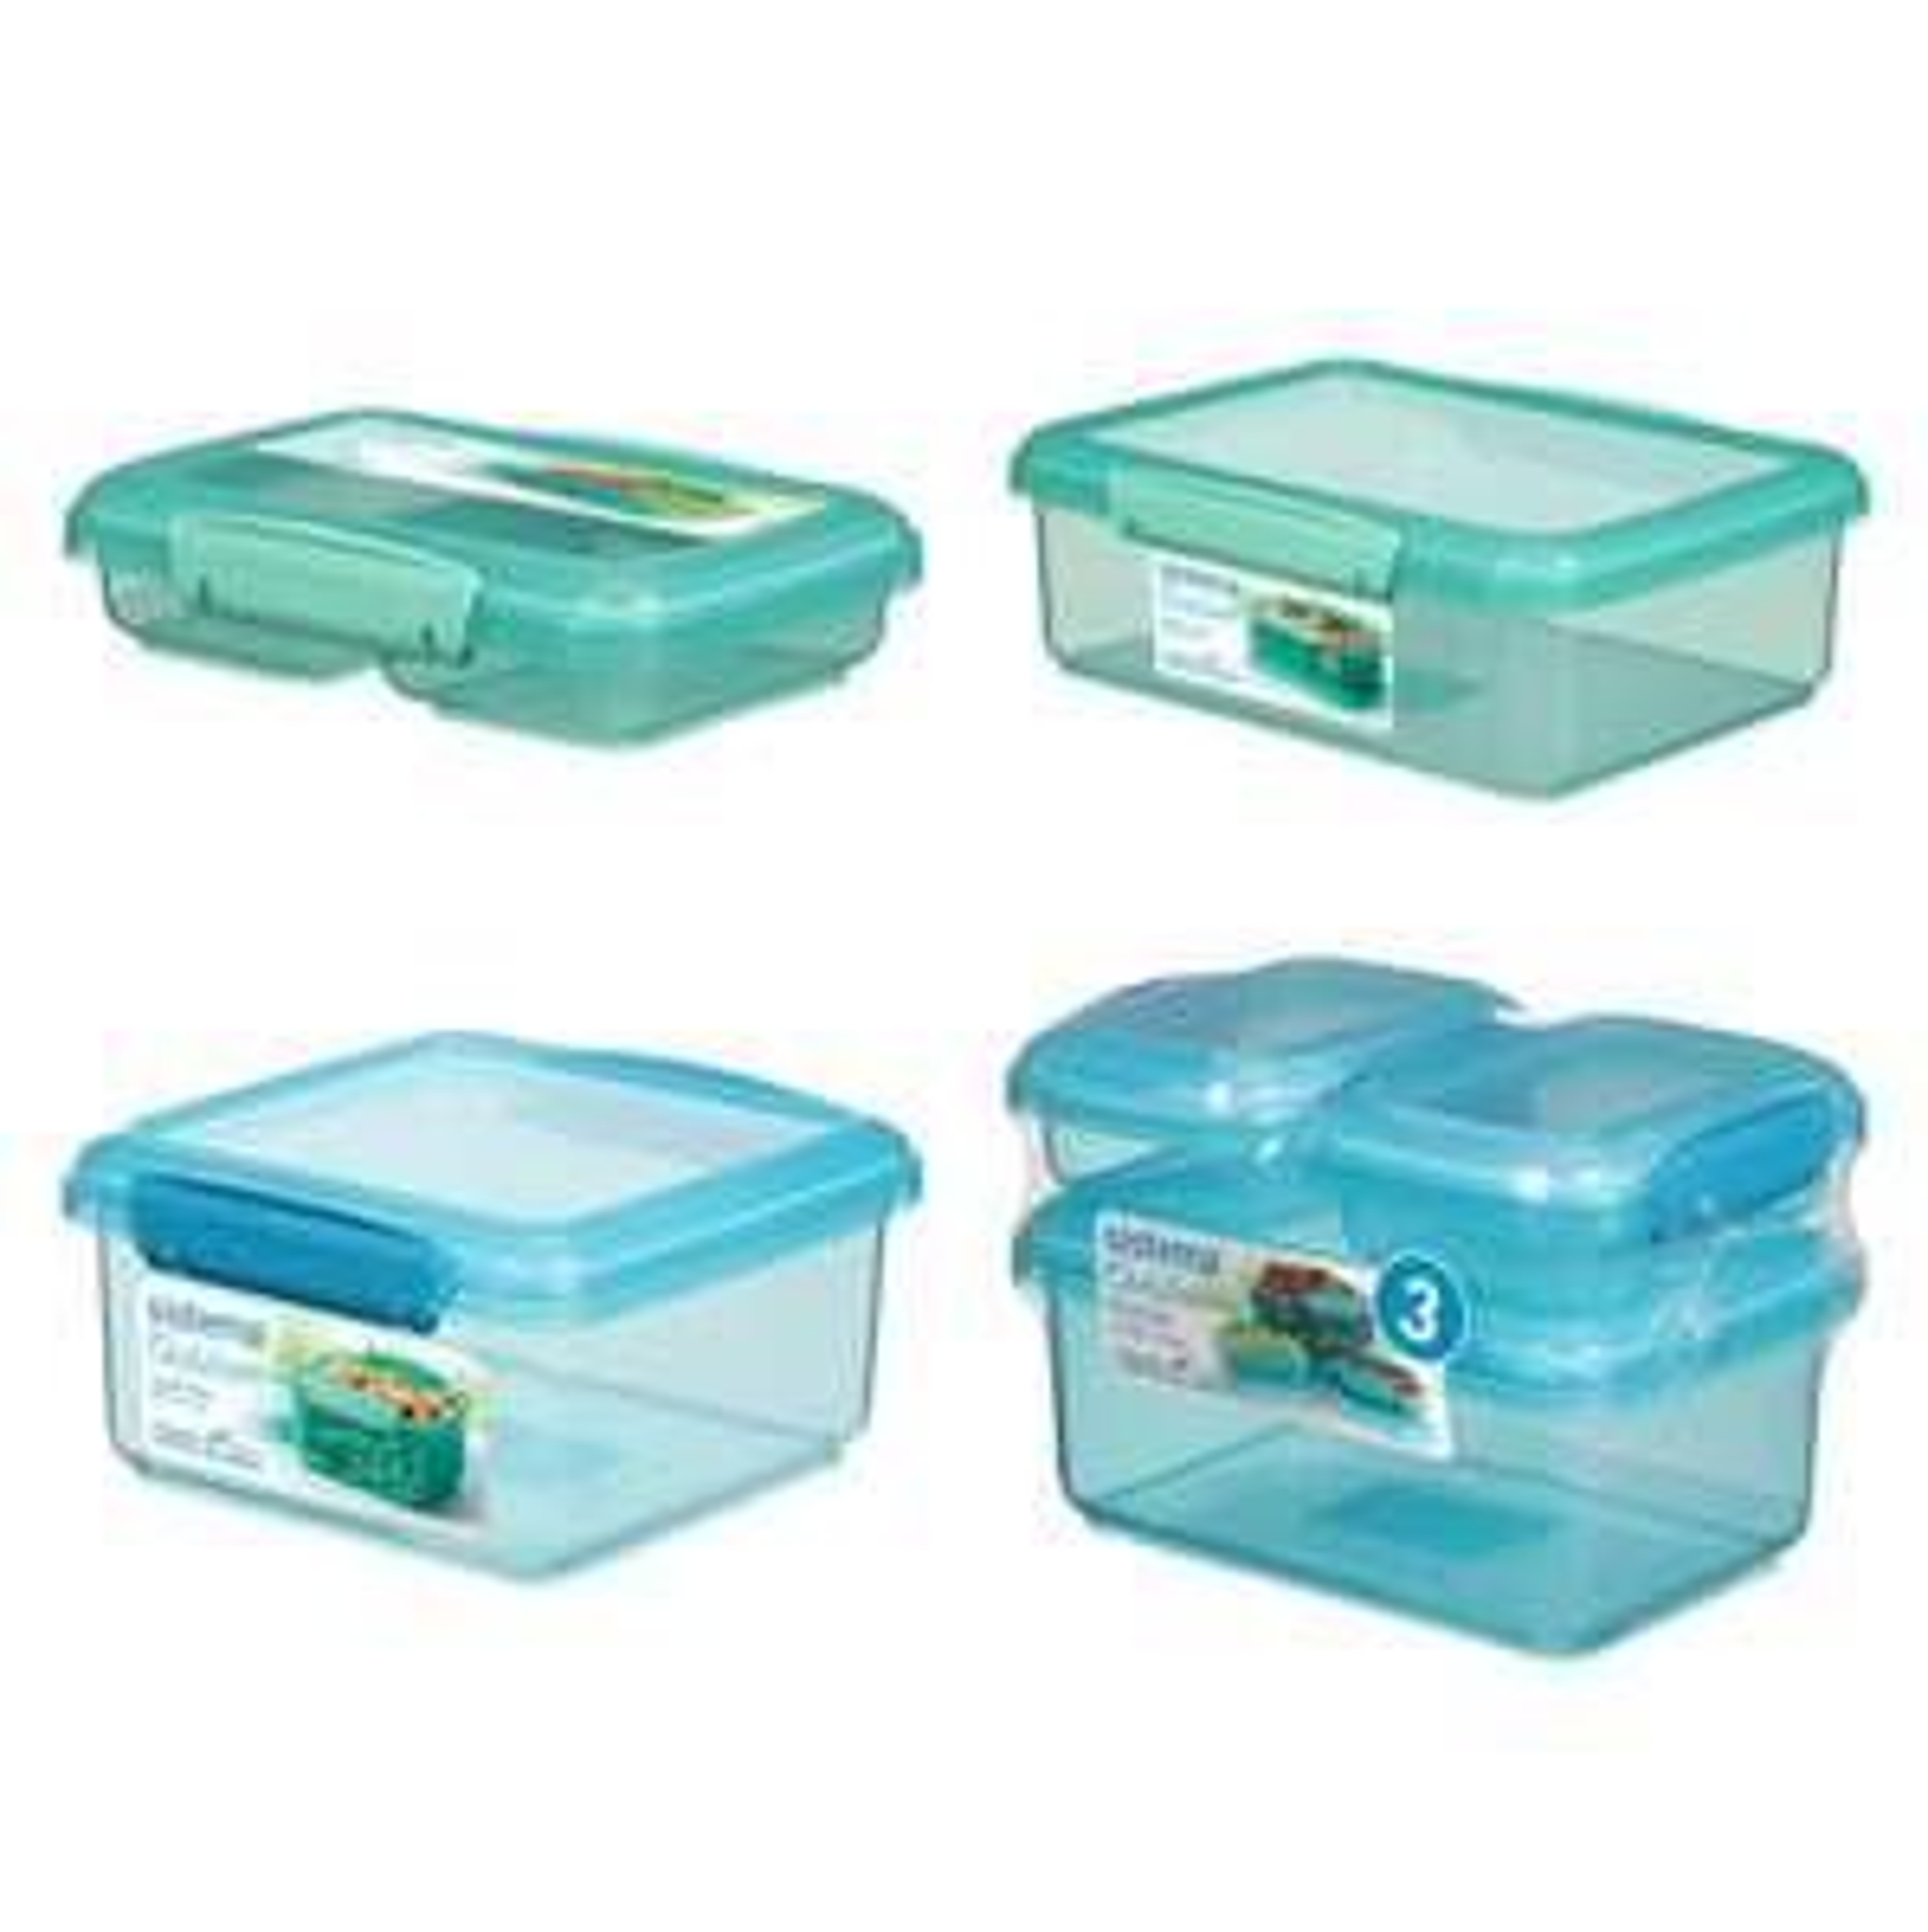 Half price Sistema Containers (Clubcard) @ Tesco e.g. Sistema Outdoor Split £1.50